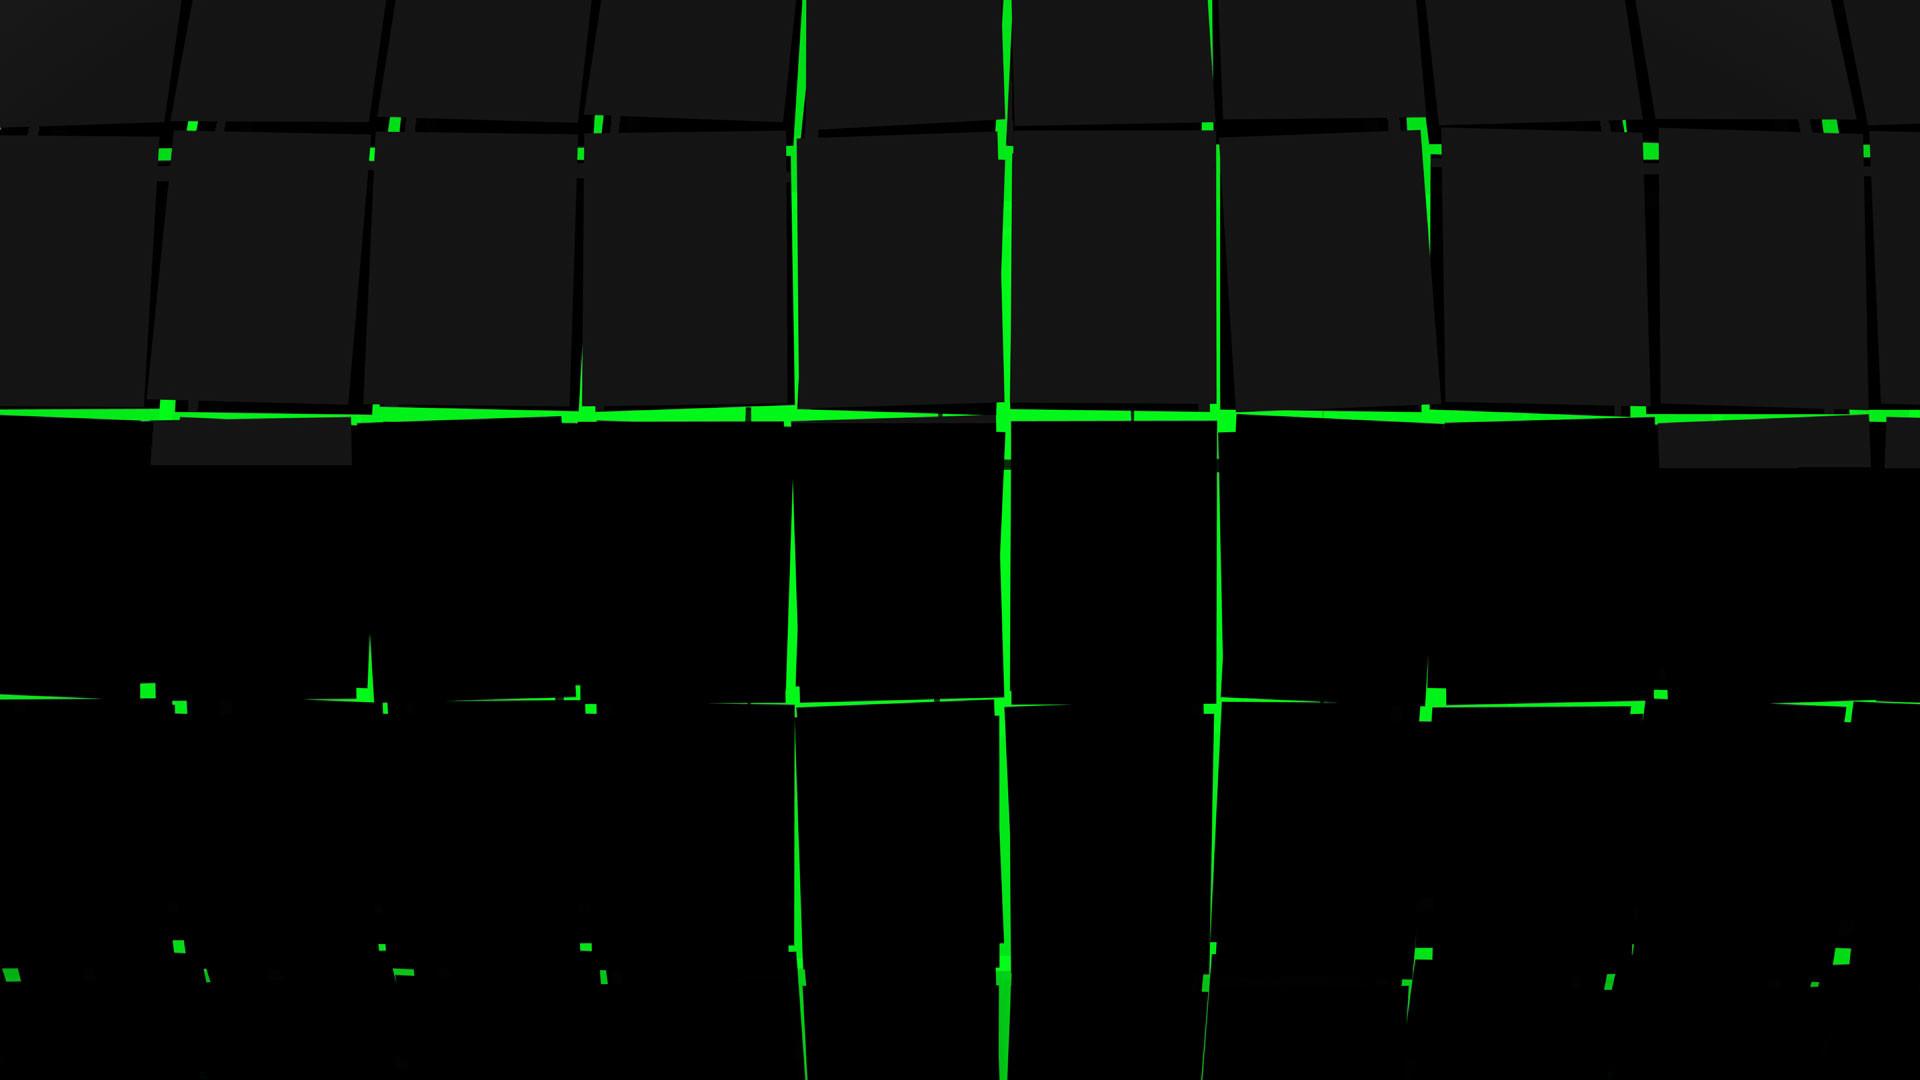 hd pics photos green technology black desktop background wallpaper